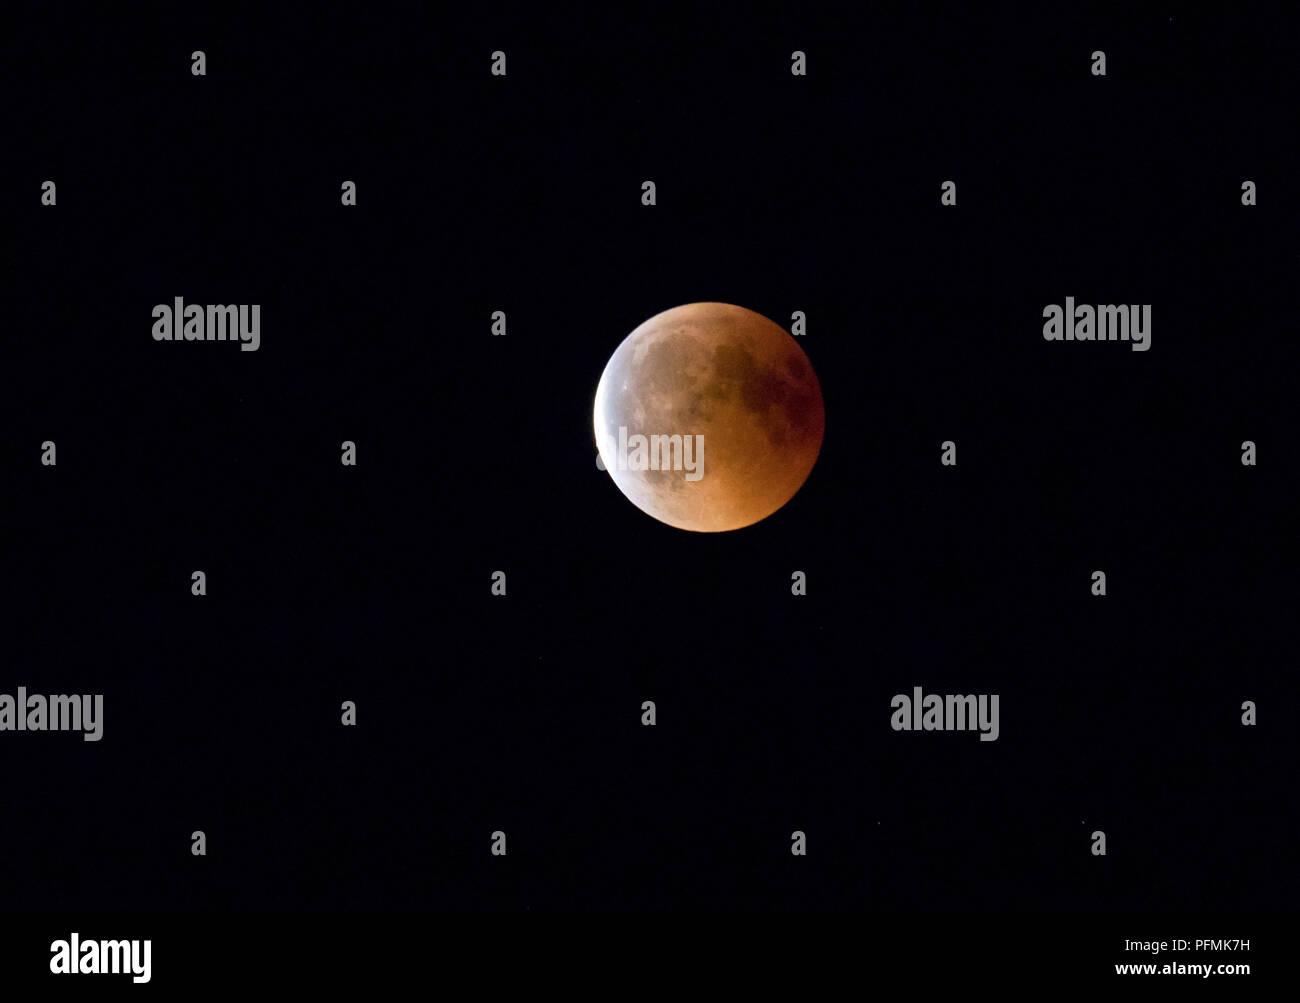 Full moon, blood moon in total lunar eclipse, 27.07.2018, Rosenheim, Bavaria, Germany - Stock Image